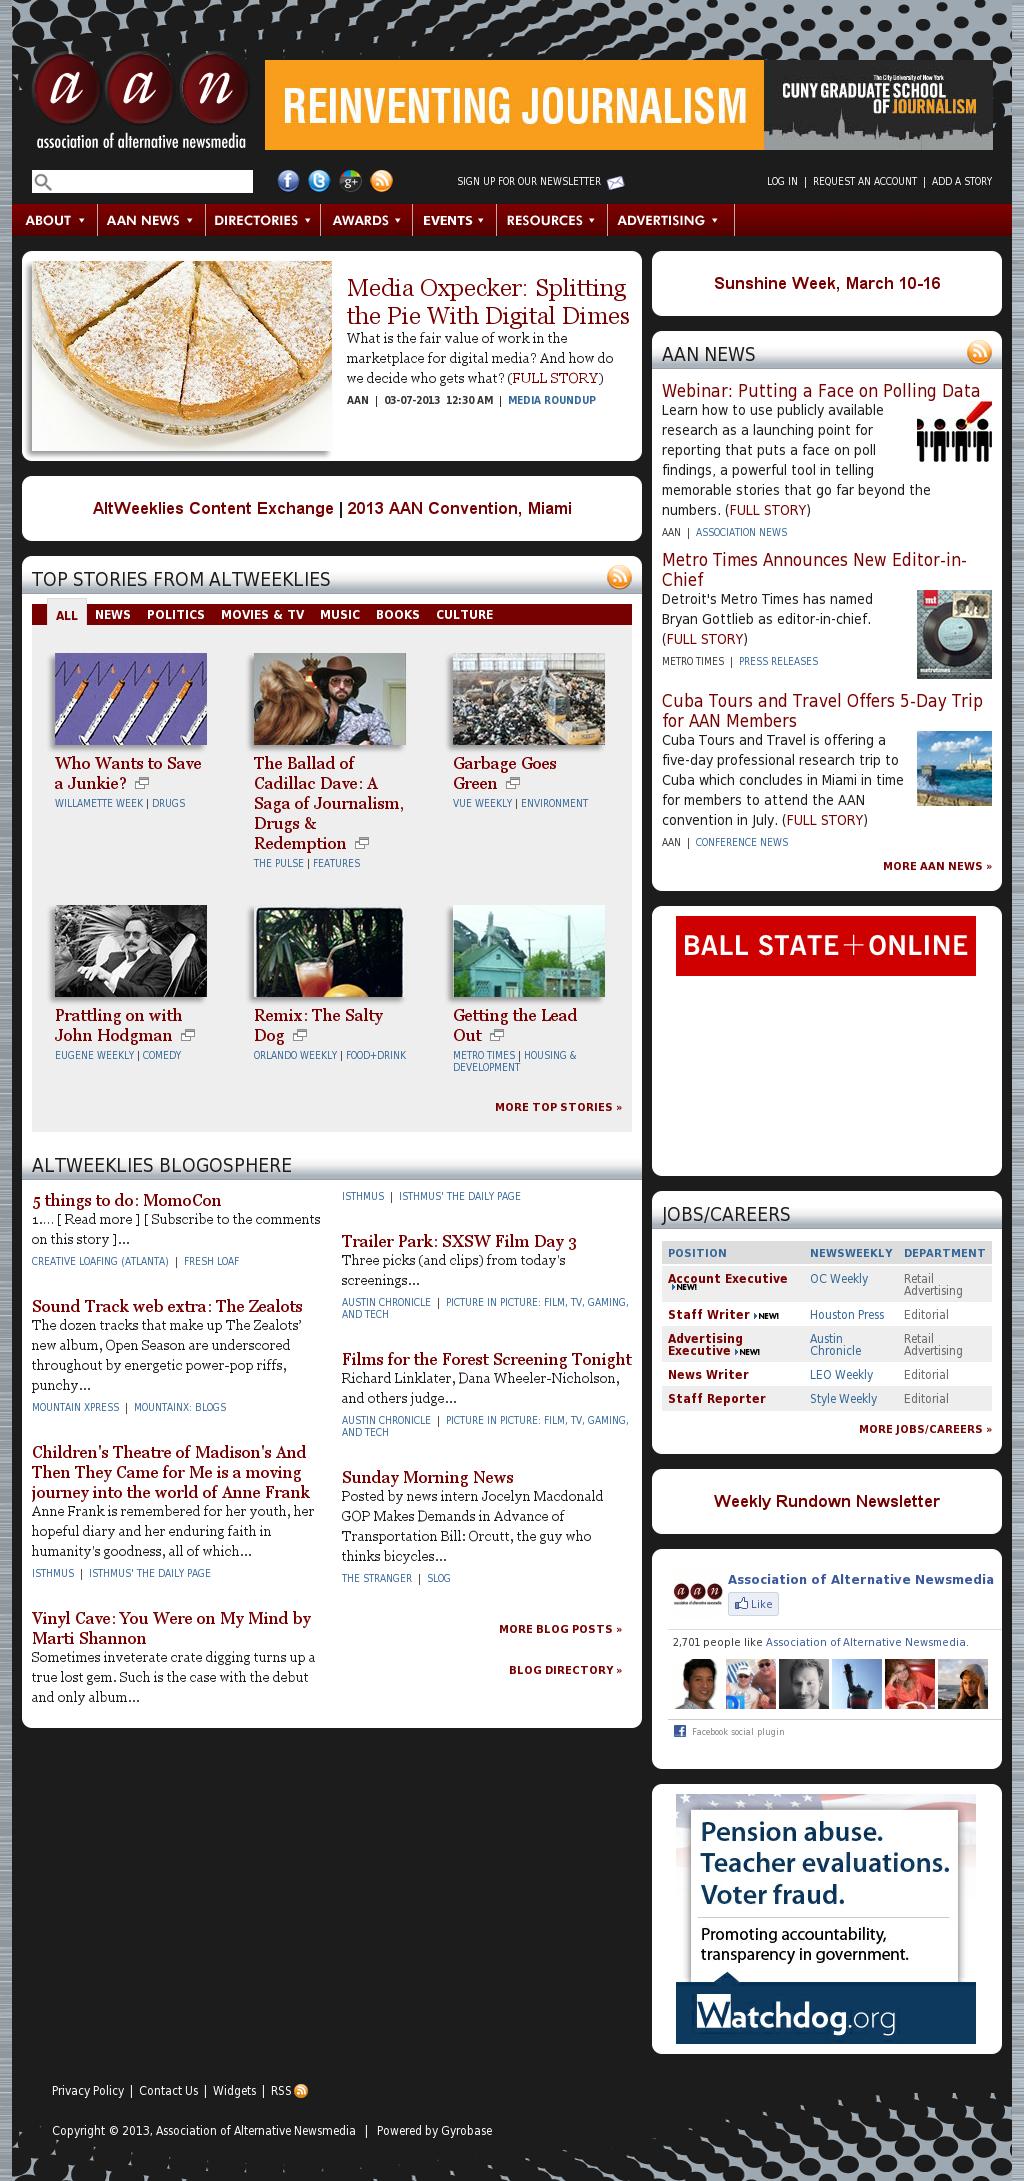 Association of Alternative Newsmedia at Sunday March 10, 2013, 7 p.m. UTC